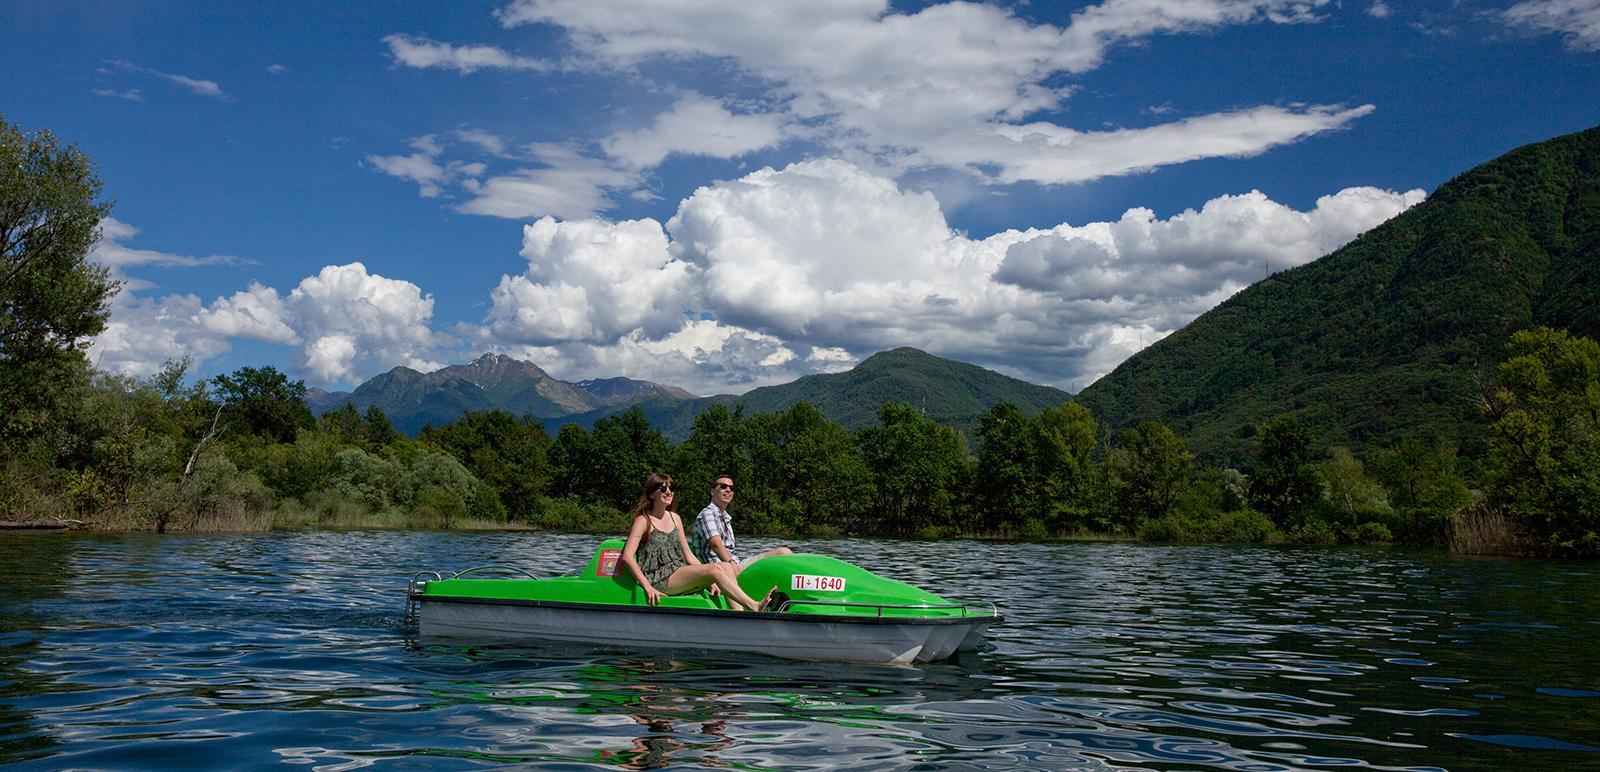 Pedalo fahren auf dem Lago Maggiore